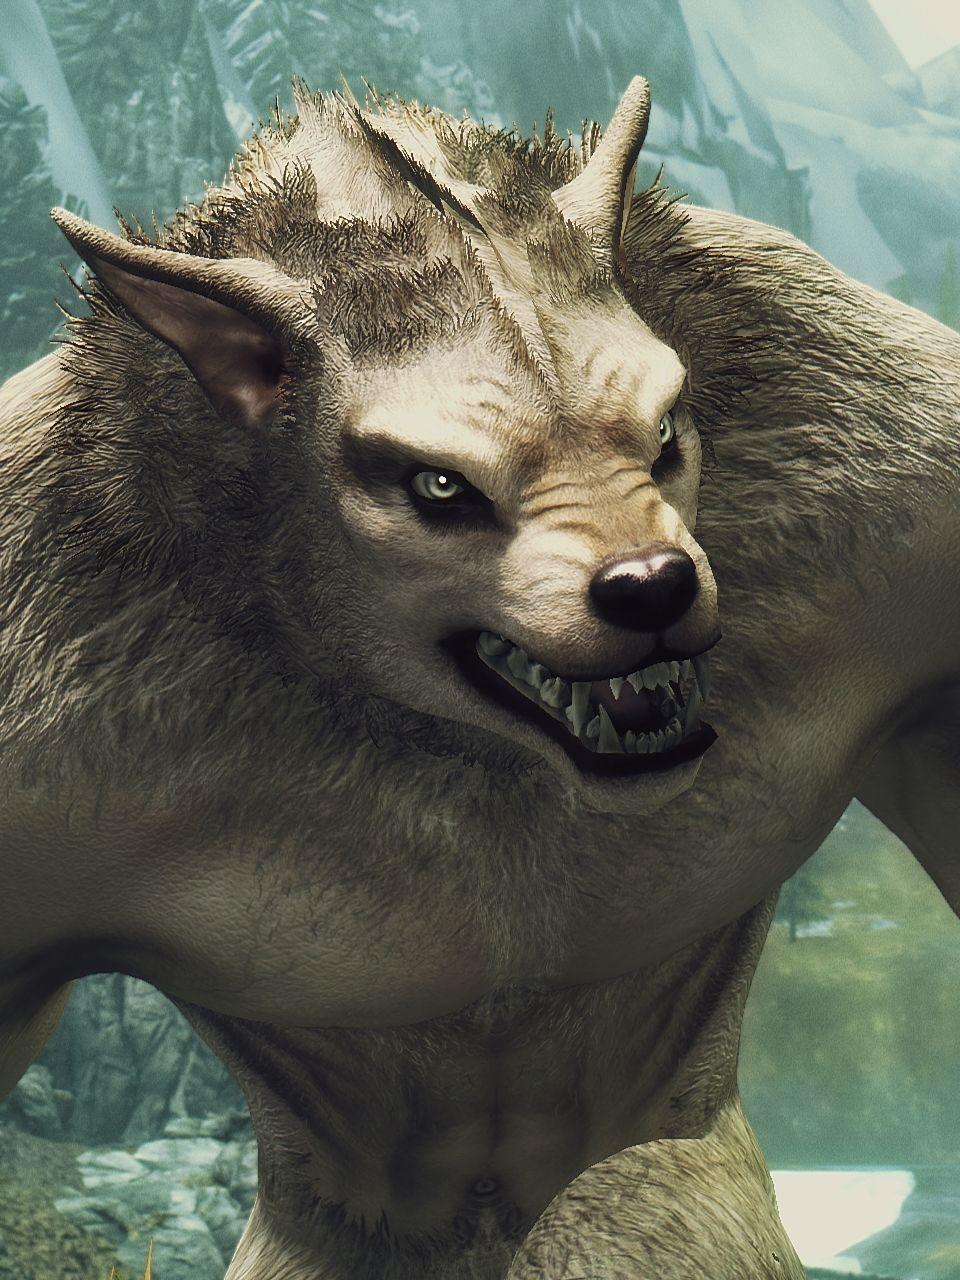 Moonlight Tales - Werewolf and Werebear Essentials at Skyrim